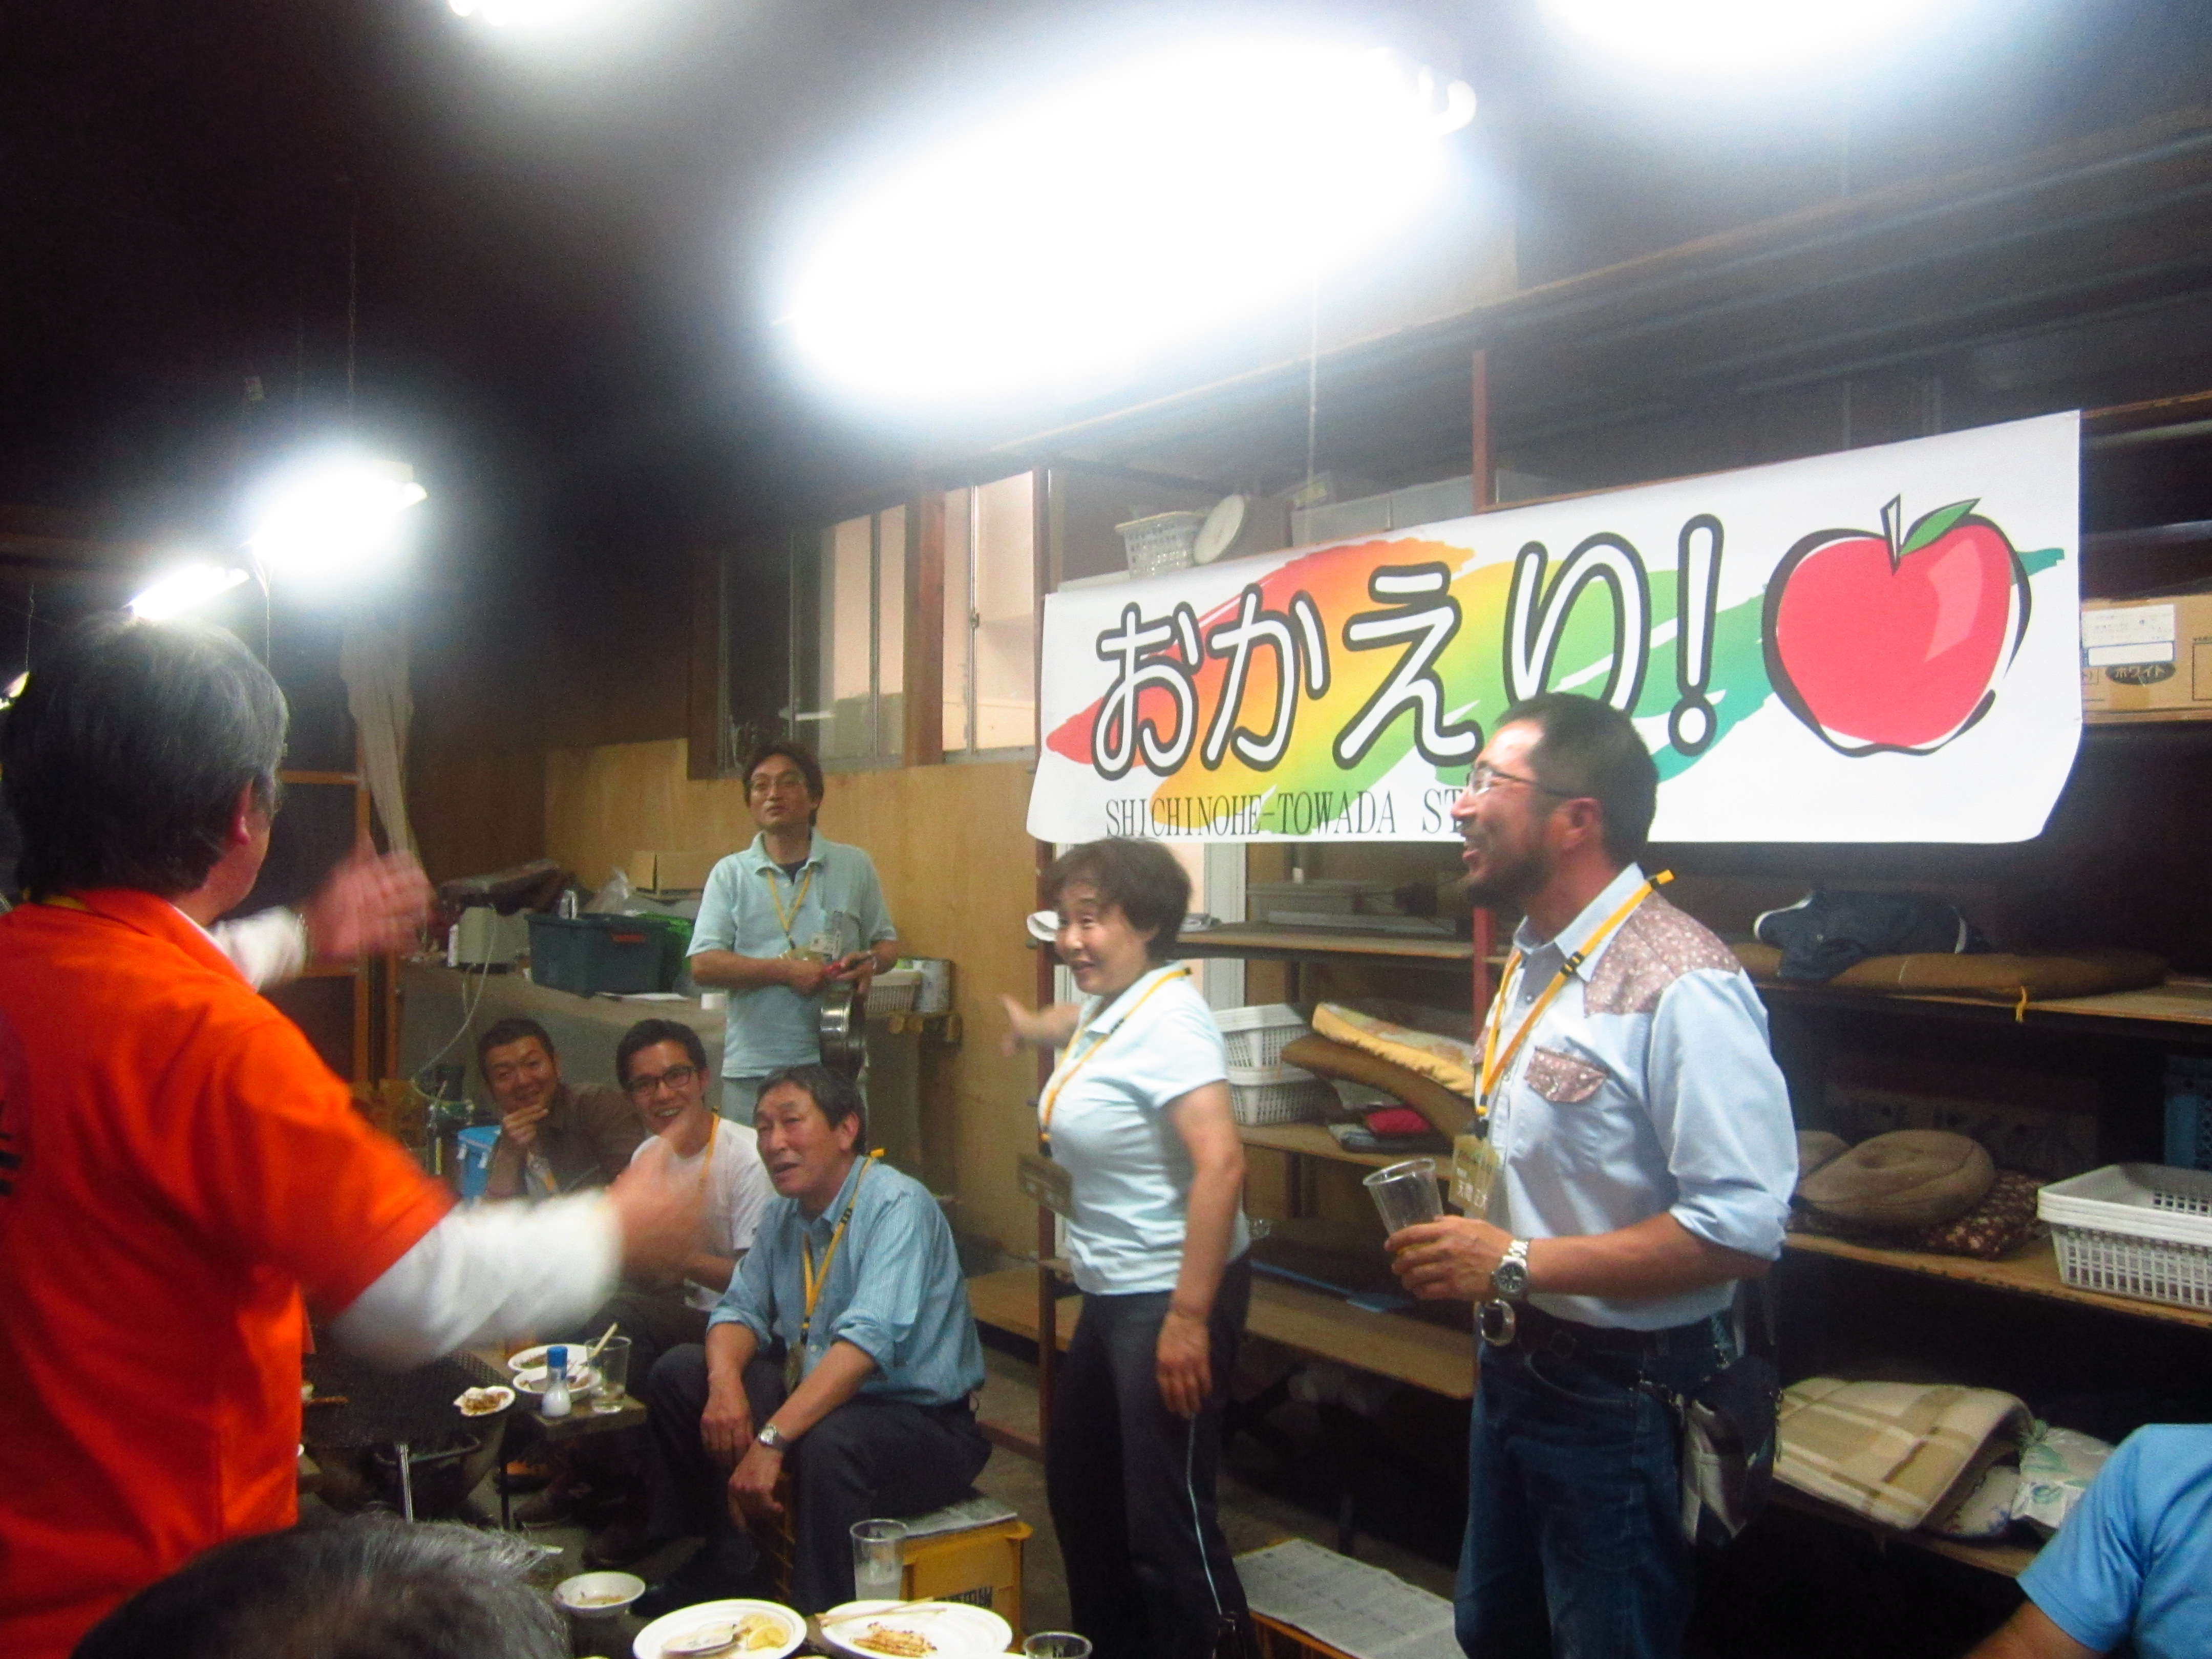 IMG 4420 - 麻布十番納涼祭り25,26日(七戸町出店)